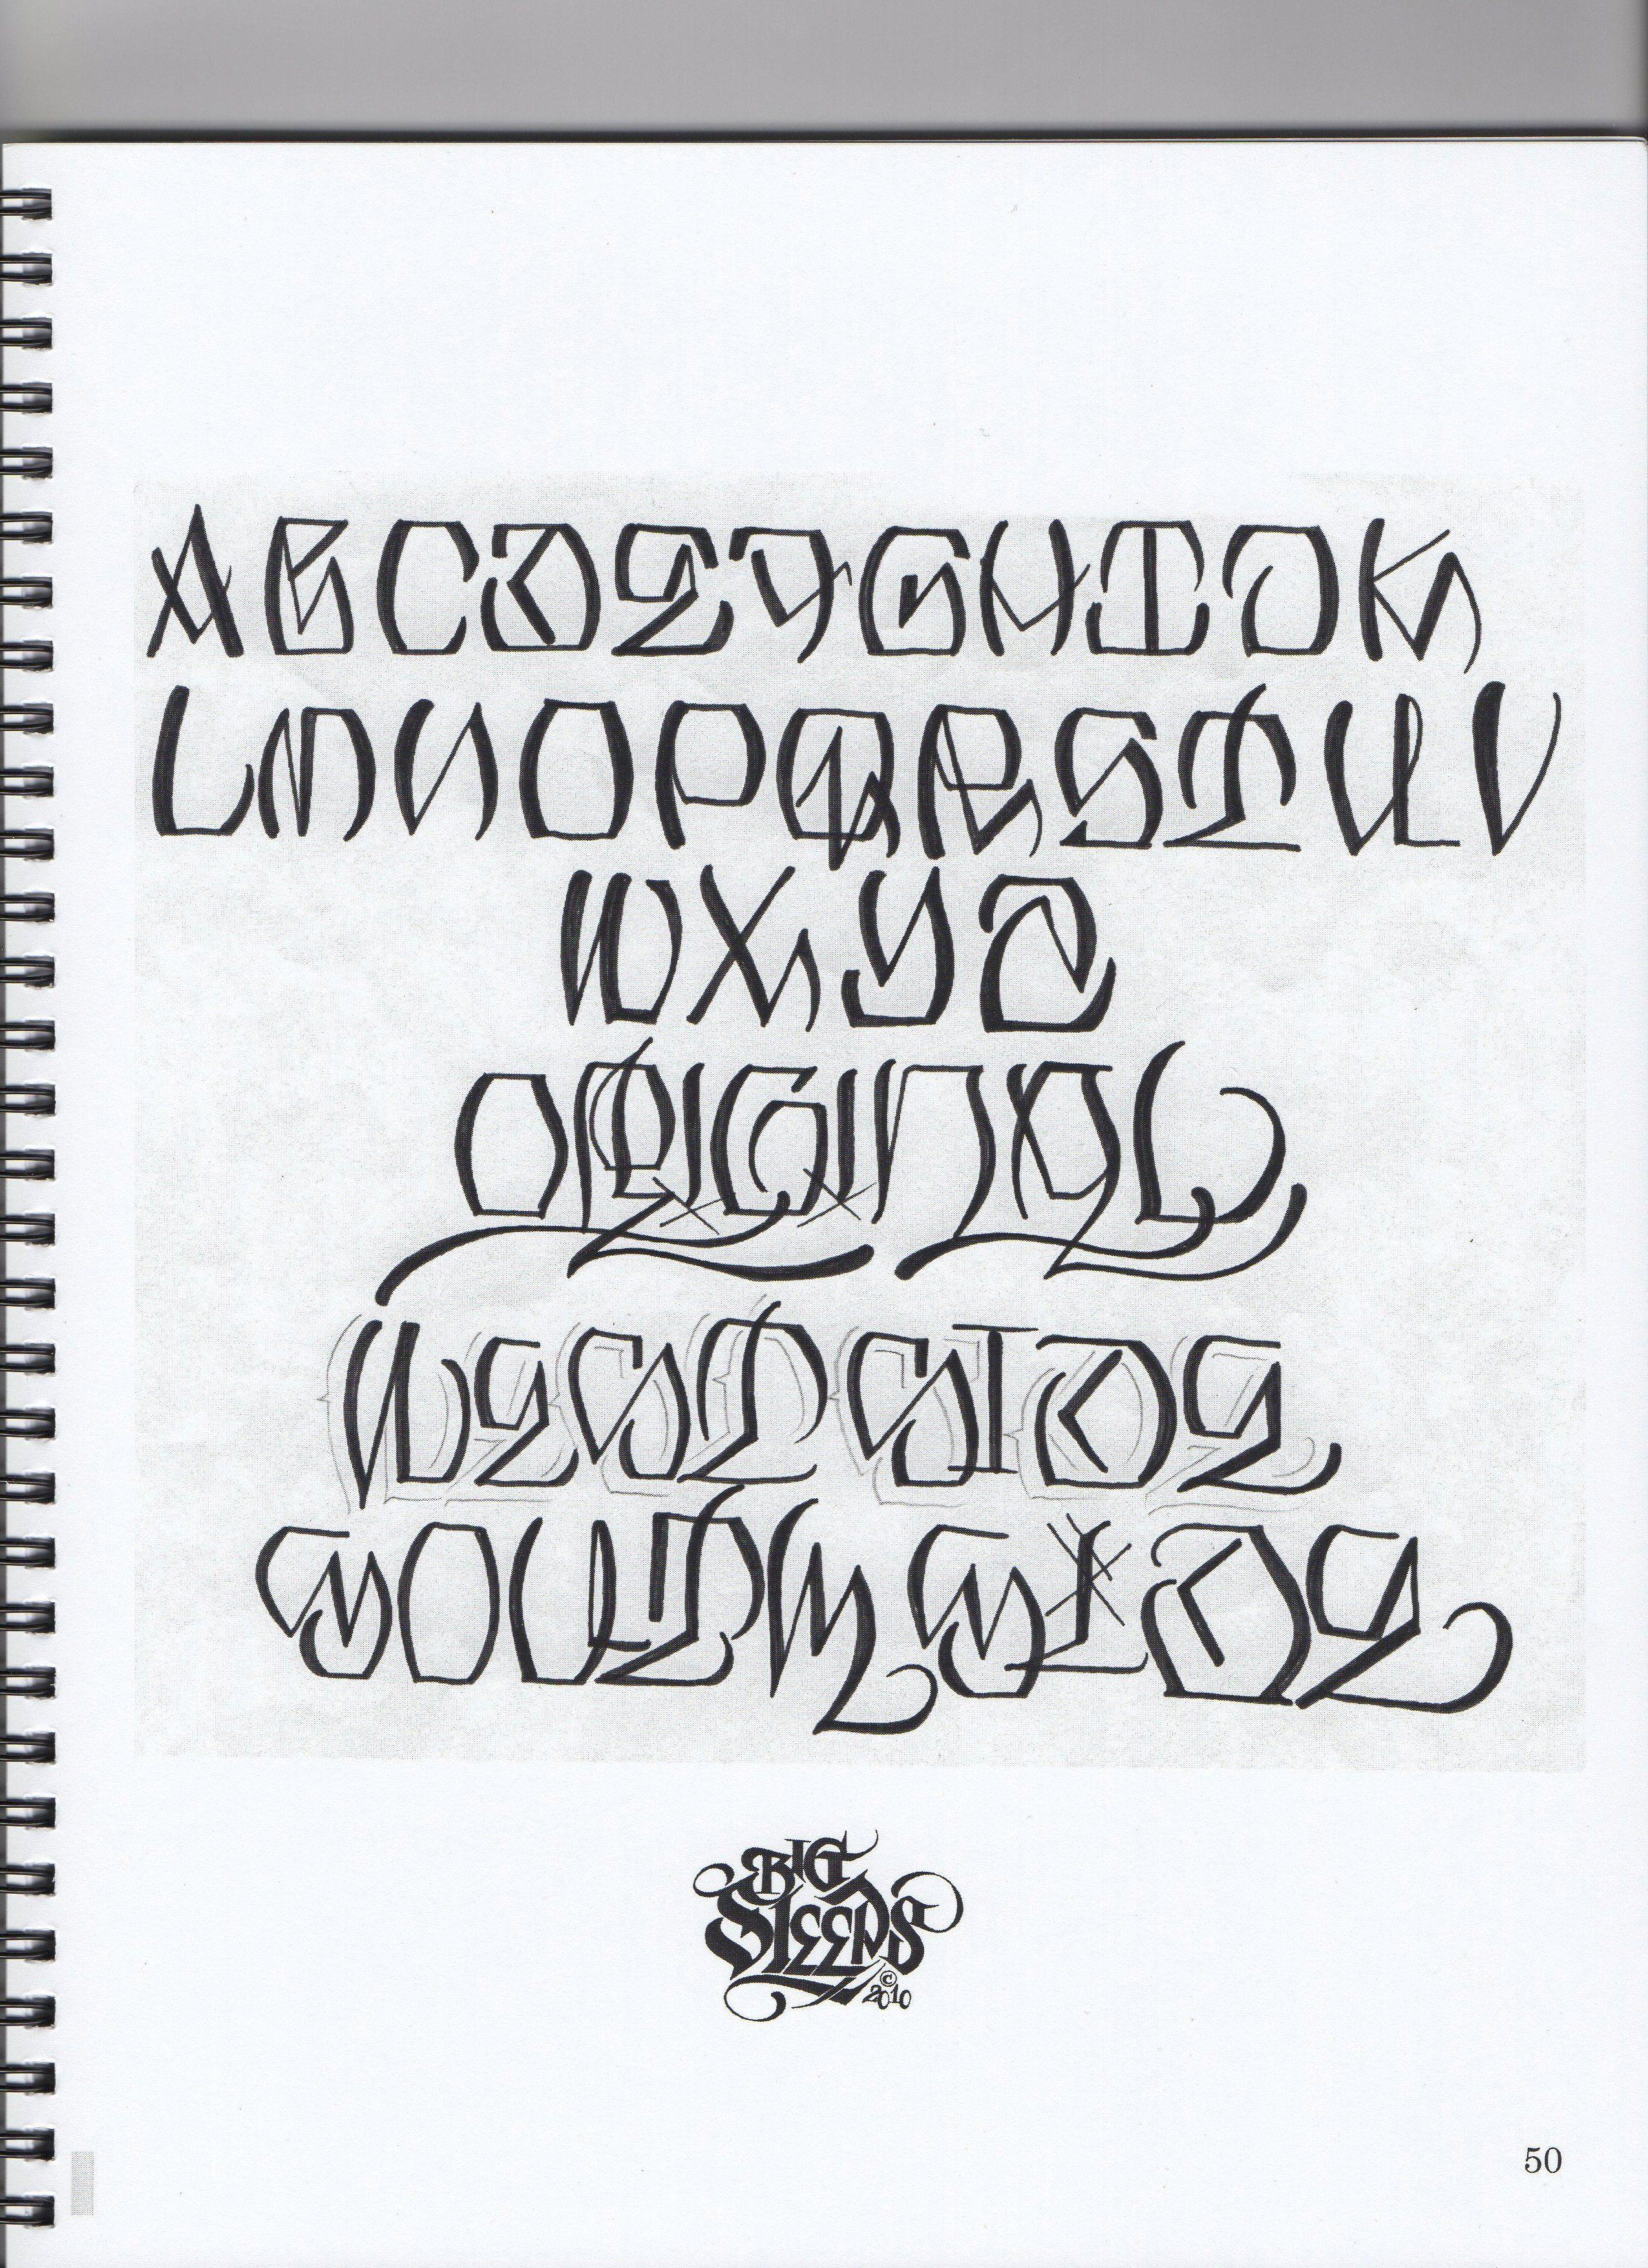 Big Sleep Lettering Fonts Tattoo Lettering Fonts Lettering